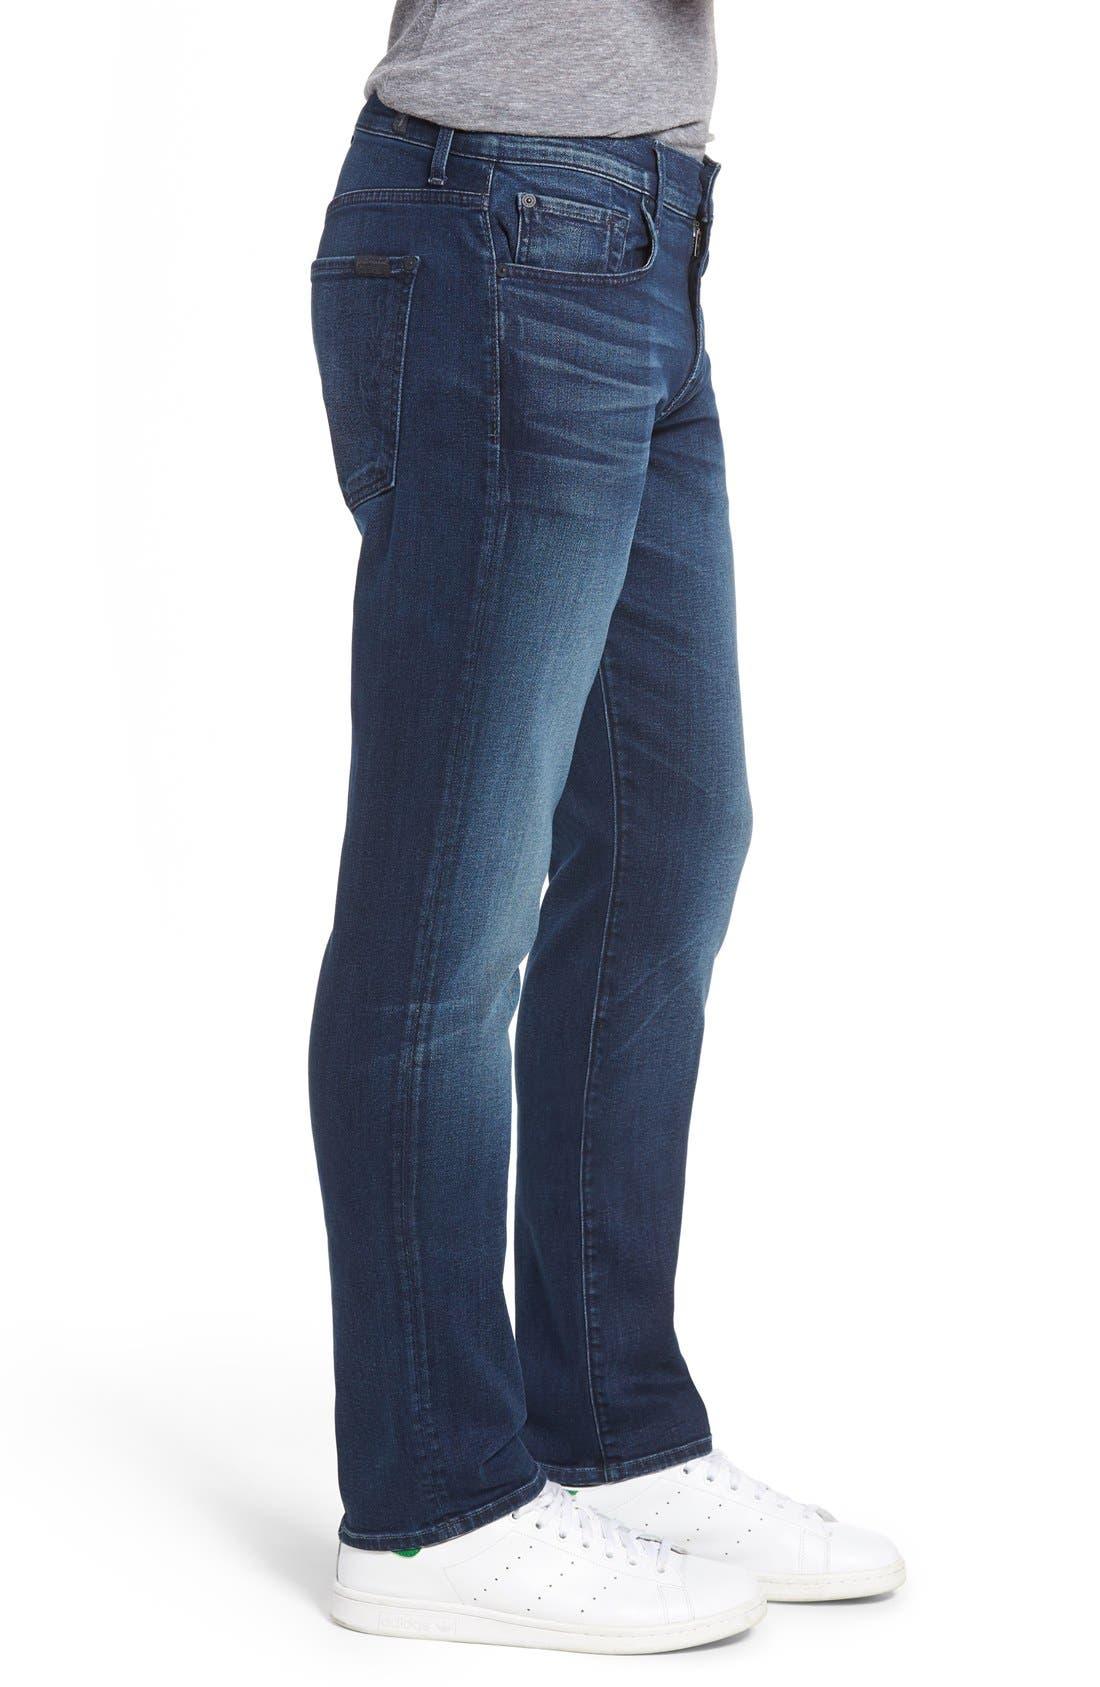 Slimmy Luxe Performance Slim Fit Jeans,                             Alternate thumbnail 3, color,                             Belfast